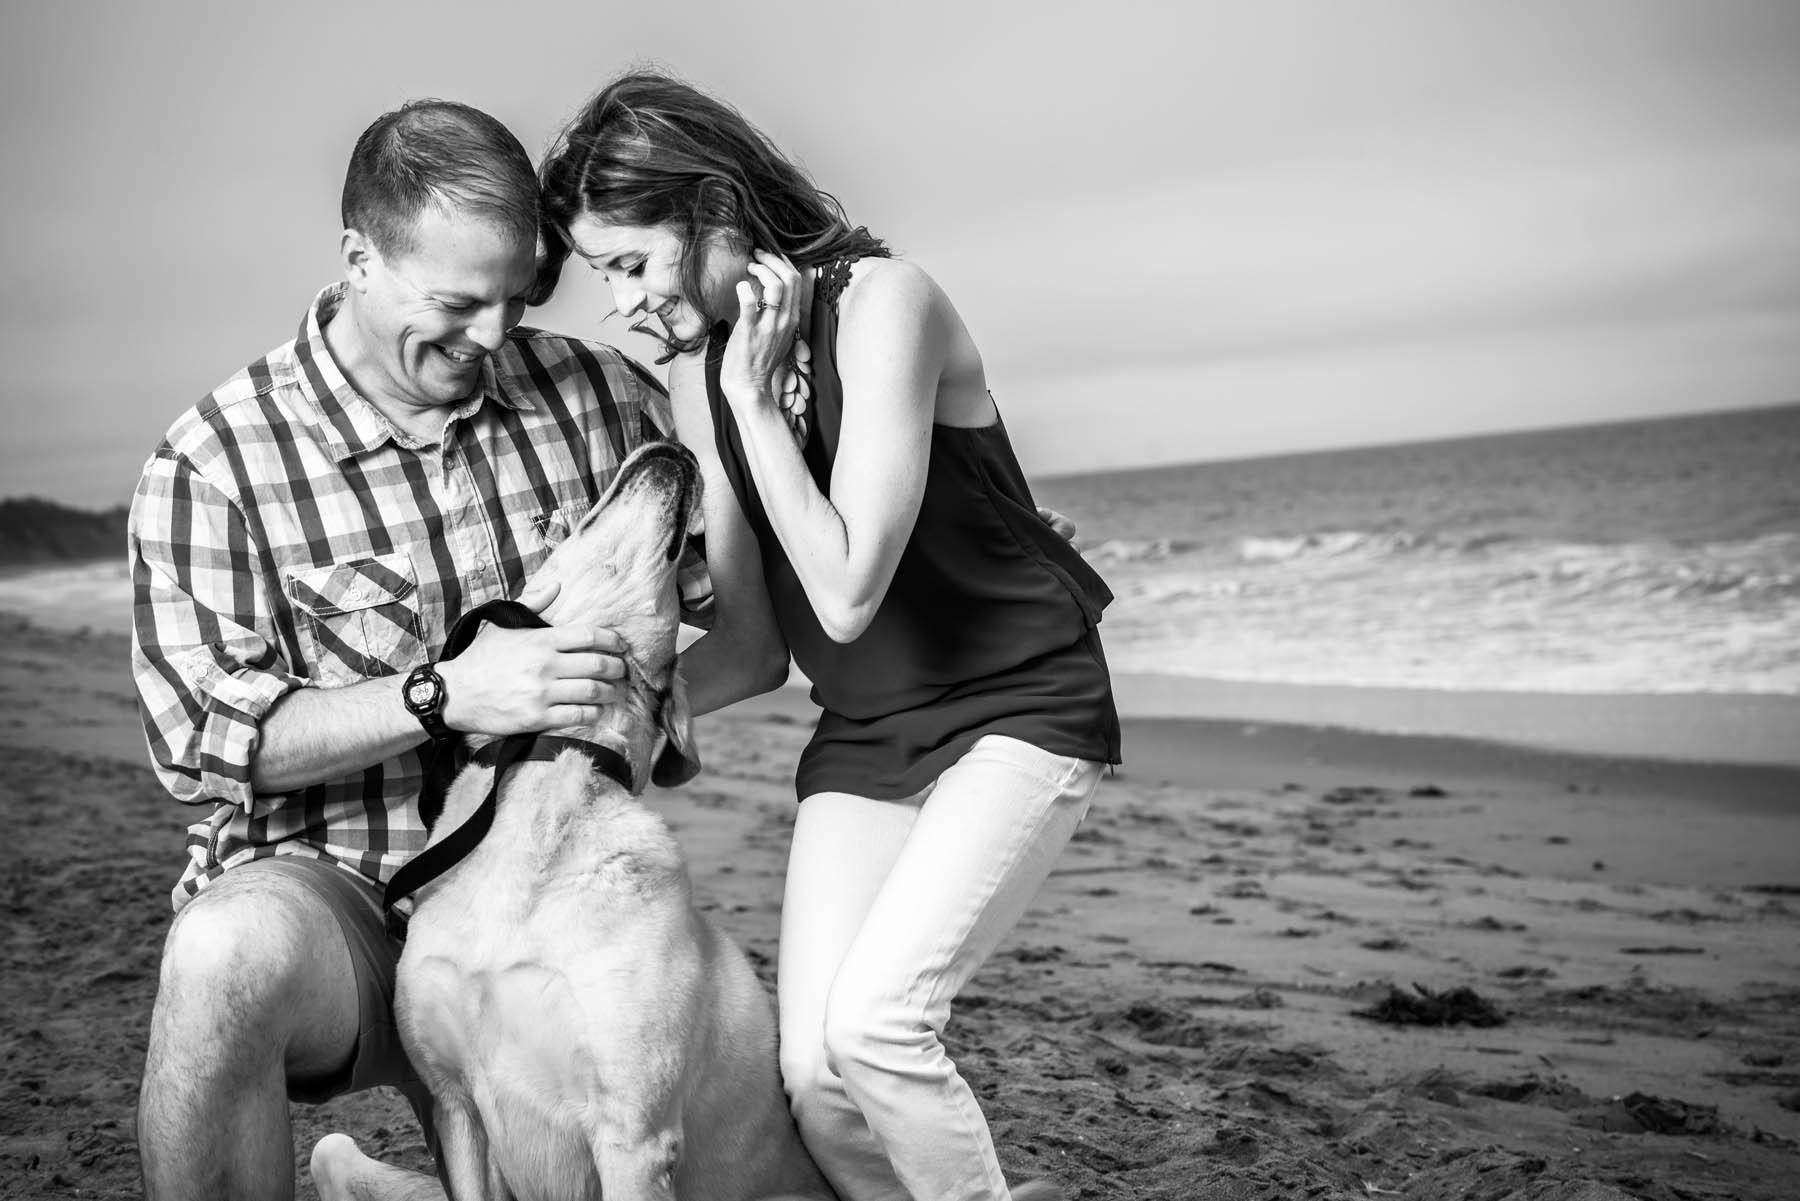 3063_d800b_Andrina_P_Rio_Del_Mar_Beach_Aptos_Family_Photography.jpg